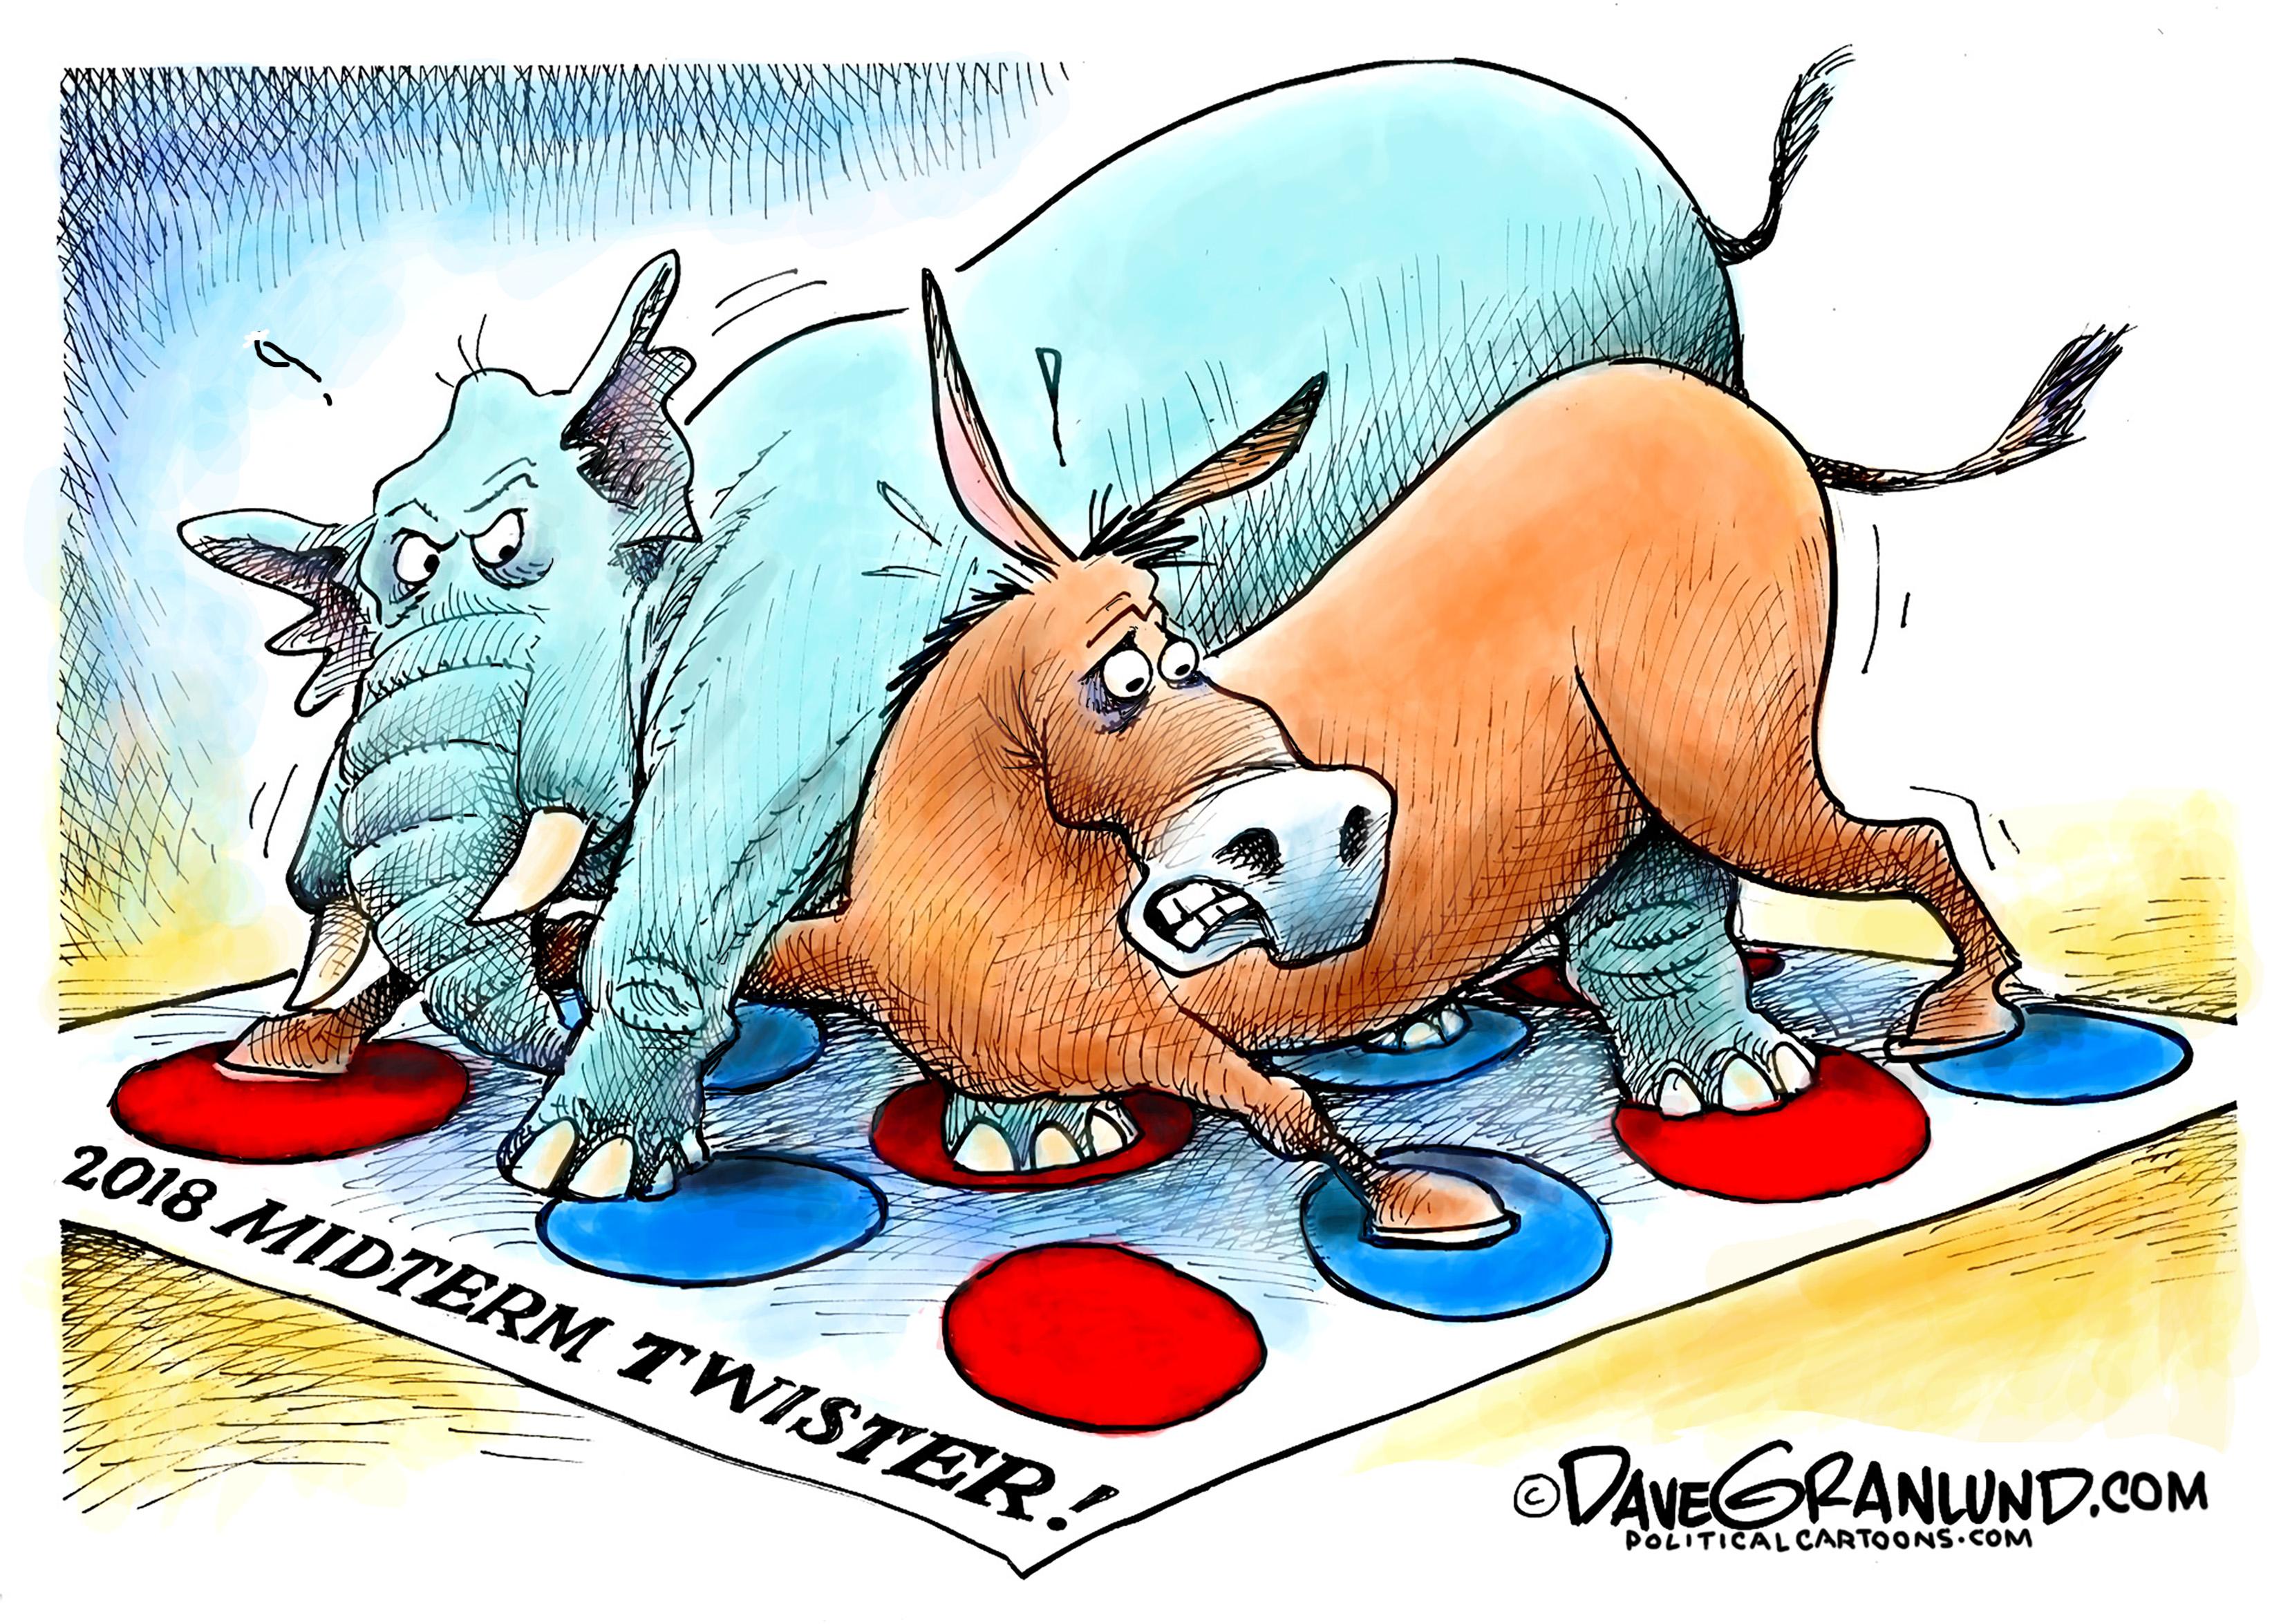 2018 midterm twister cartoon